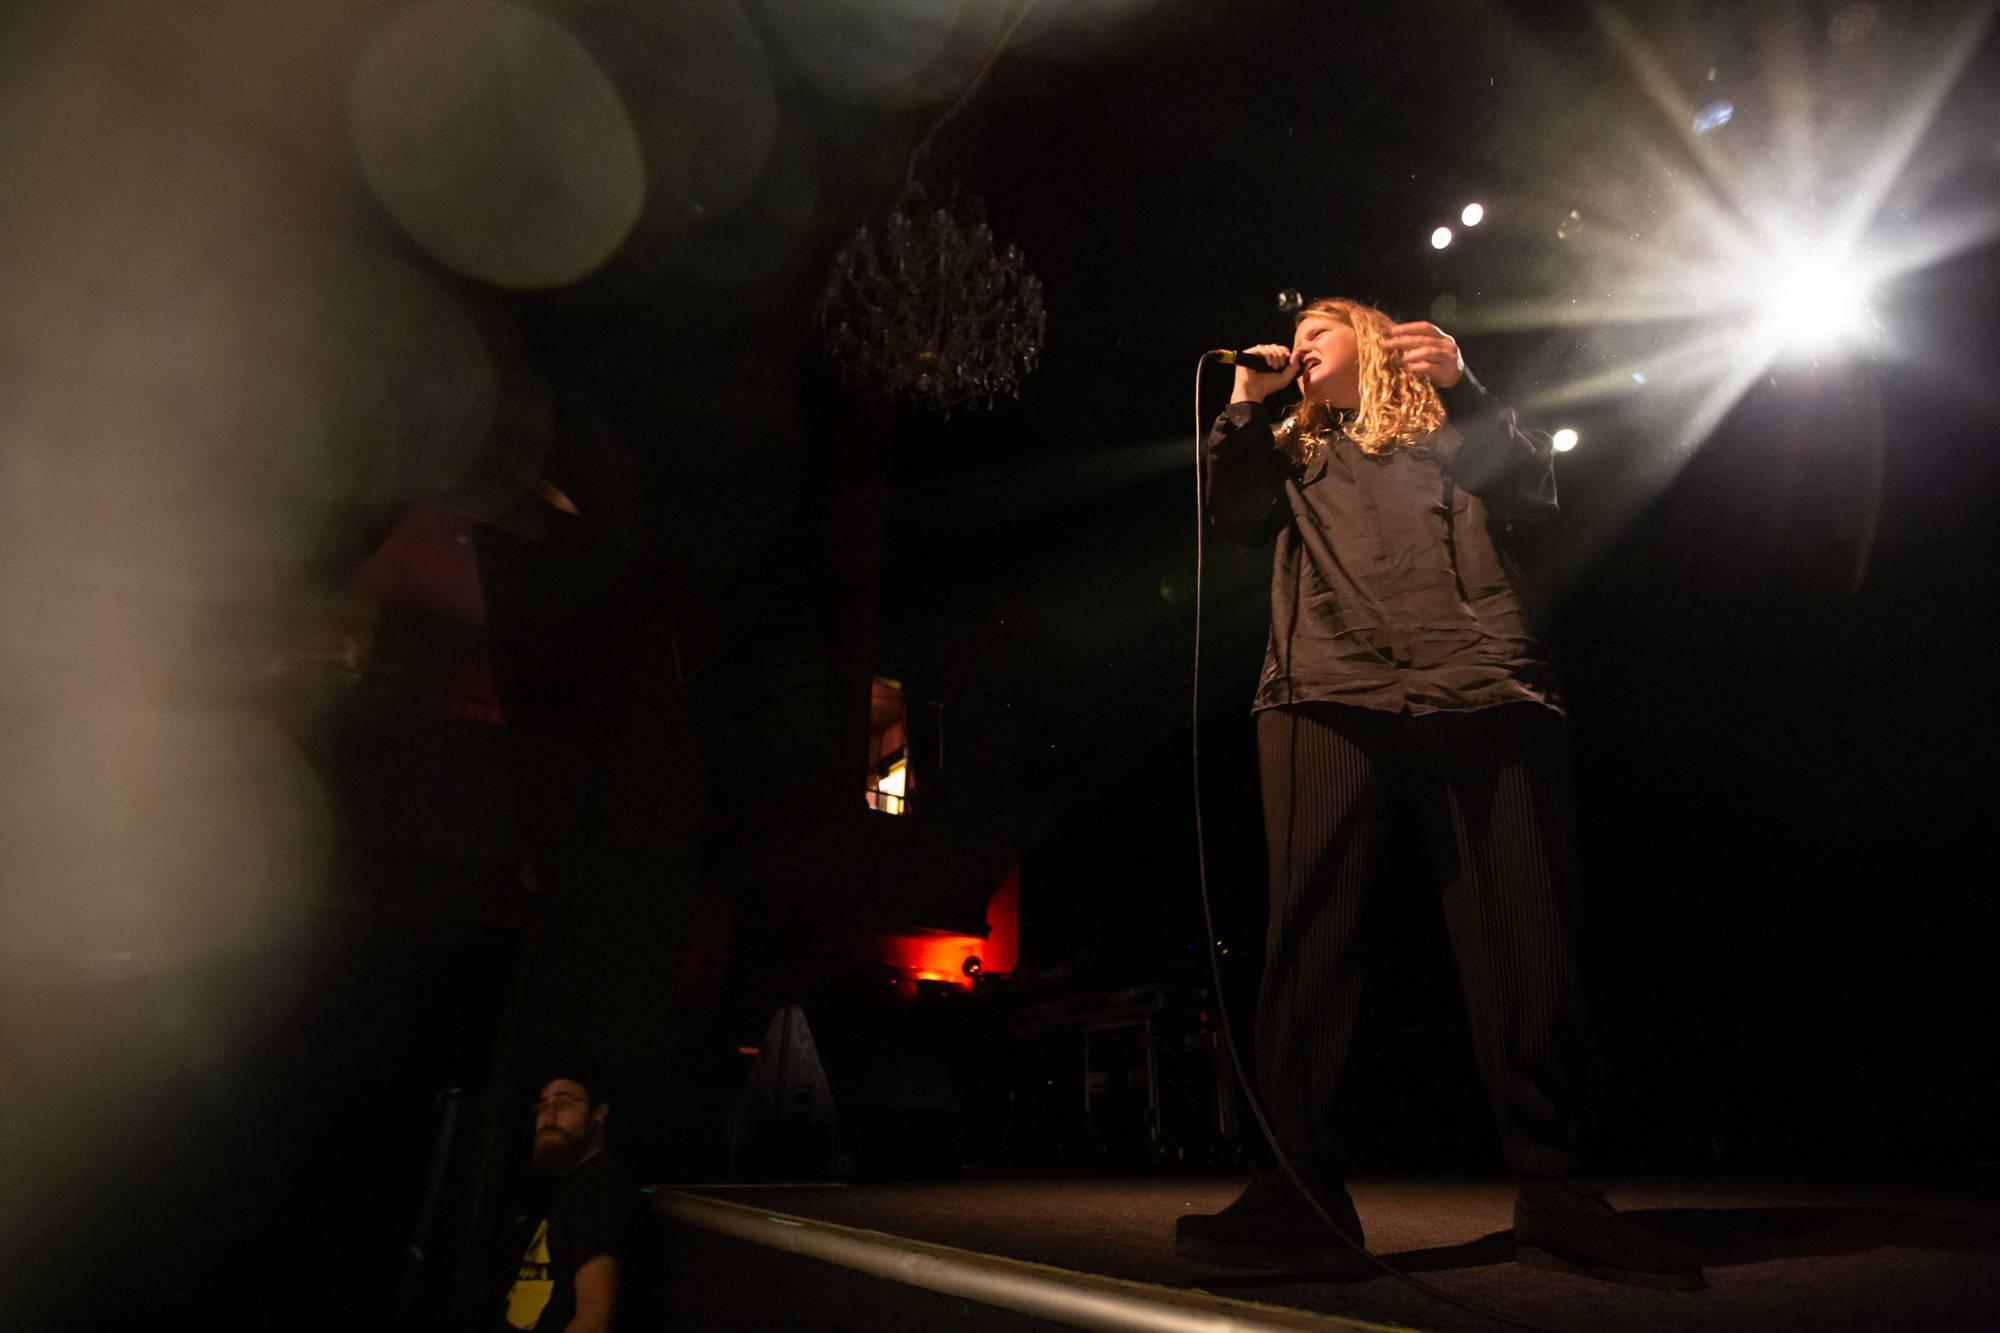 Kate Tempest at The Fillmore, San Francisco, Sep 25 2019. Kirk Chantraine photo.